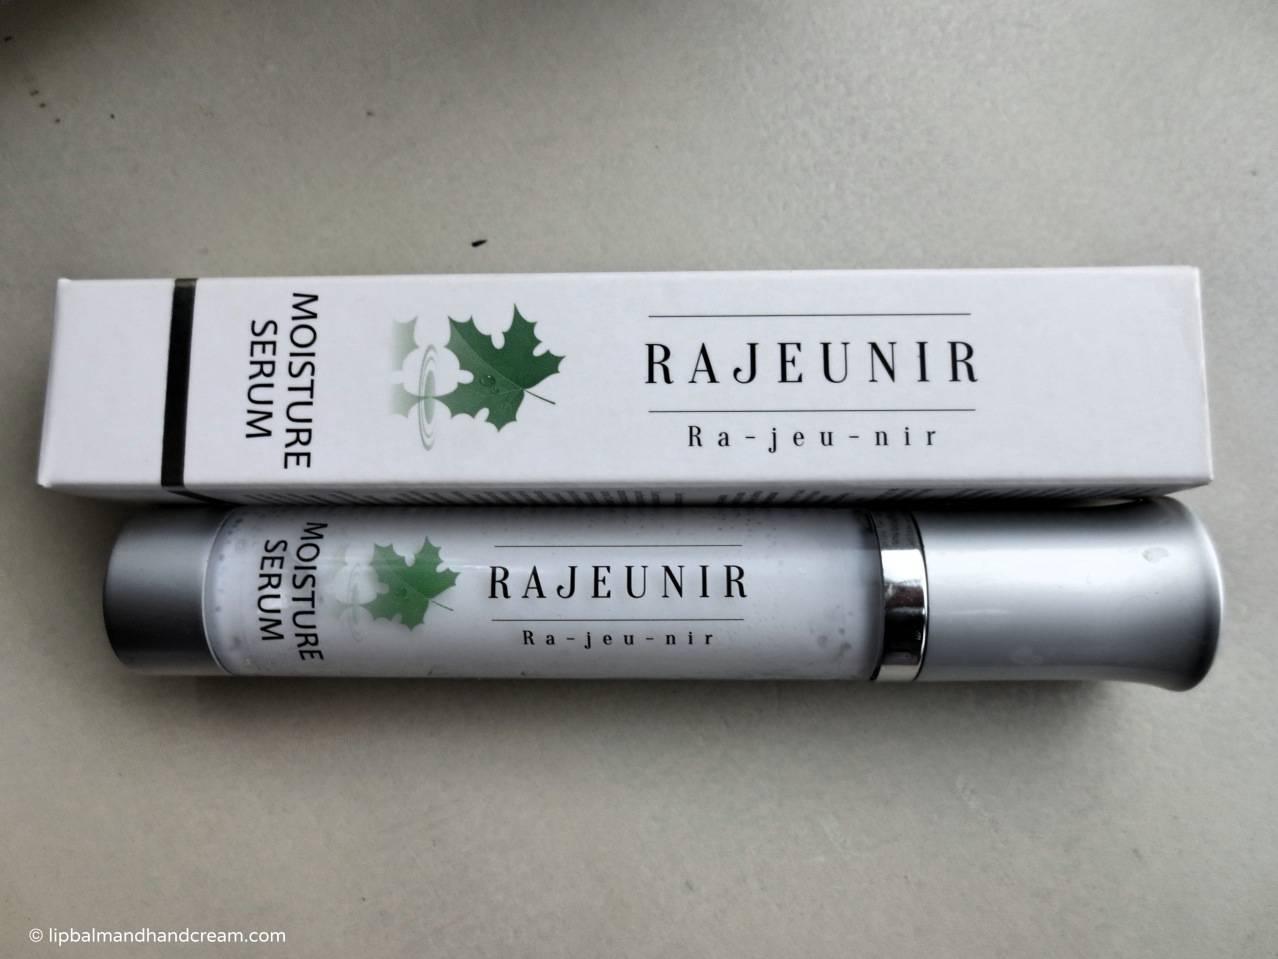 Rajeunir moisture serum